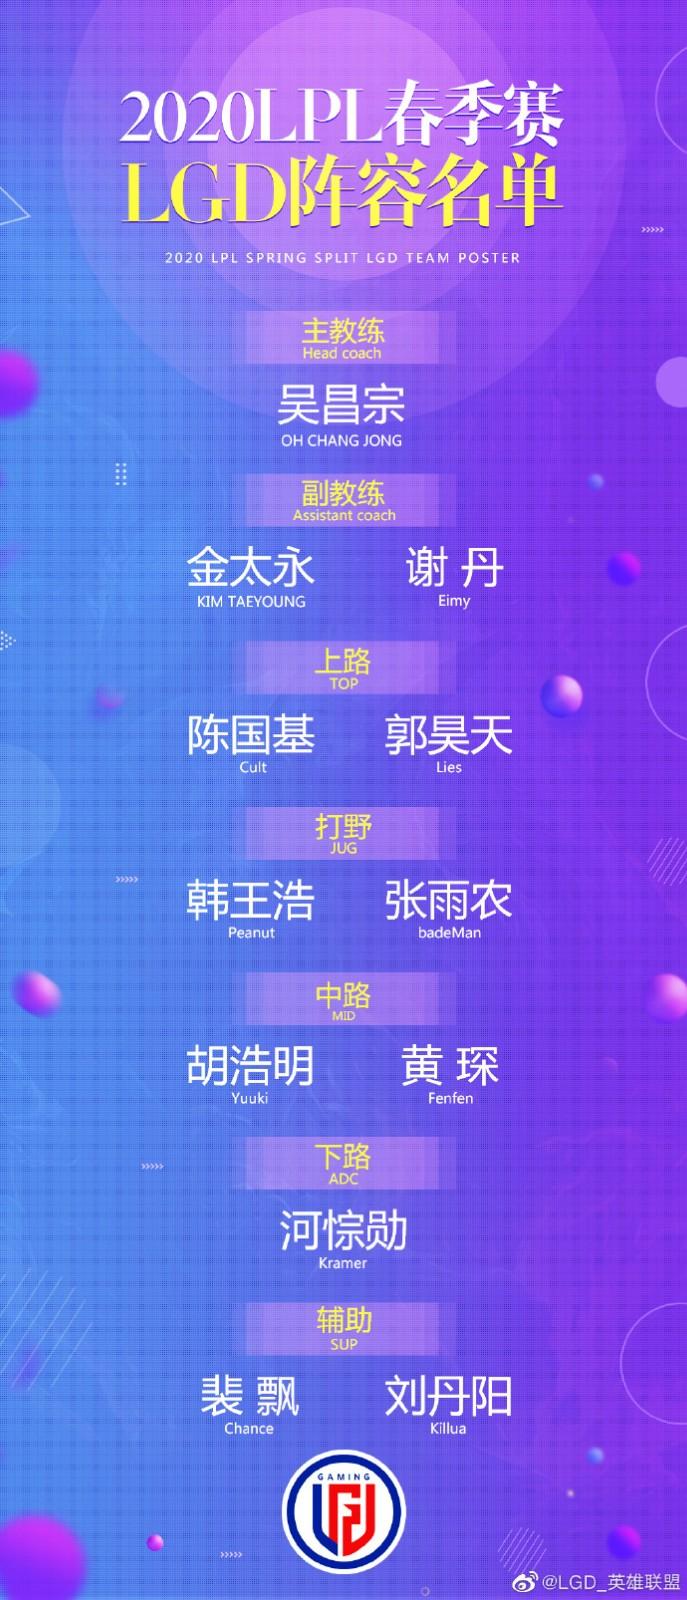 LGD官宣春季赛大名单:Peanut首发 ADC无替补